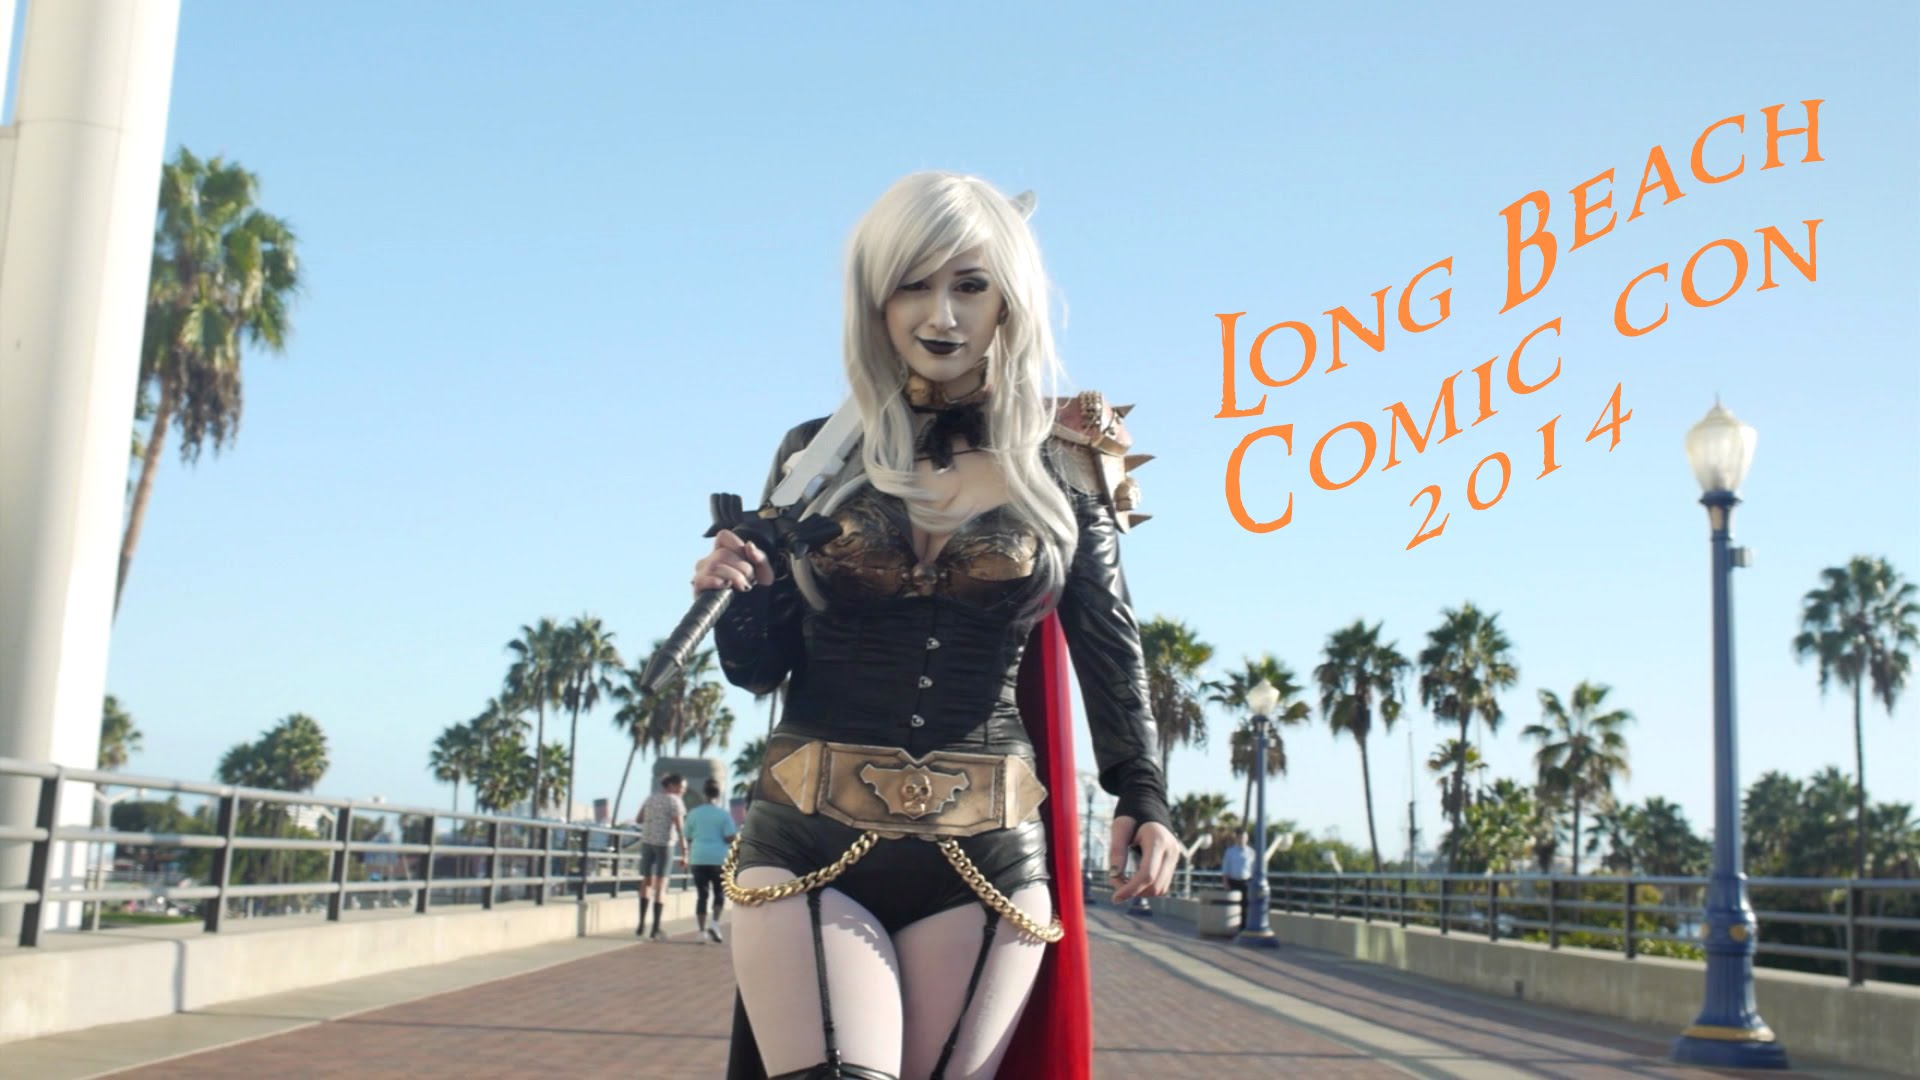 maxresdefault110 Uga Chaka: Das Cosplay Music Video von der Long Beach Comic Con 2014 zu Hooked on a Feeling